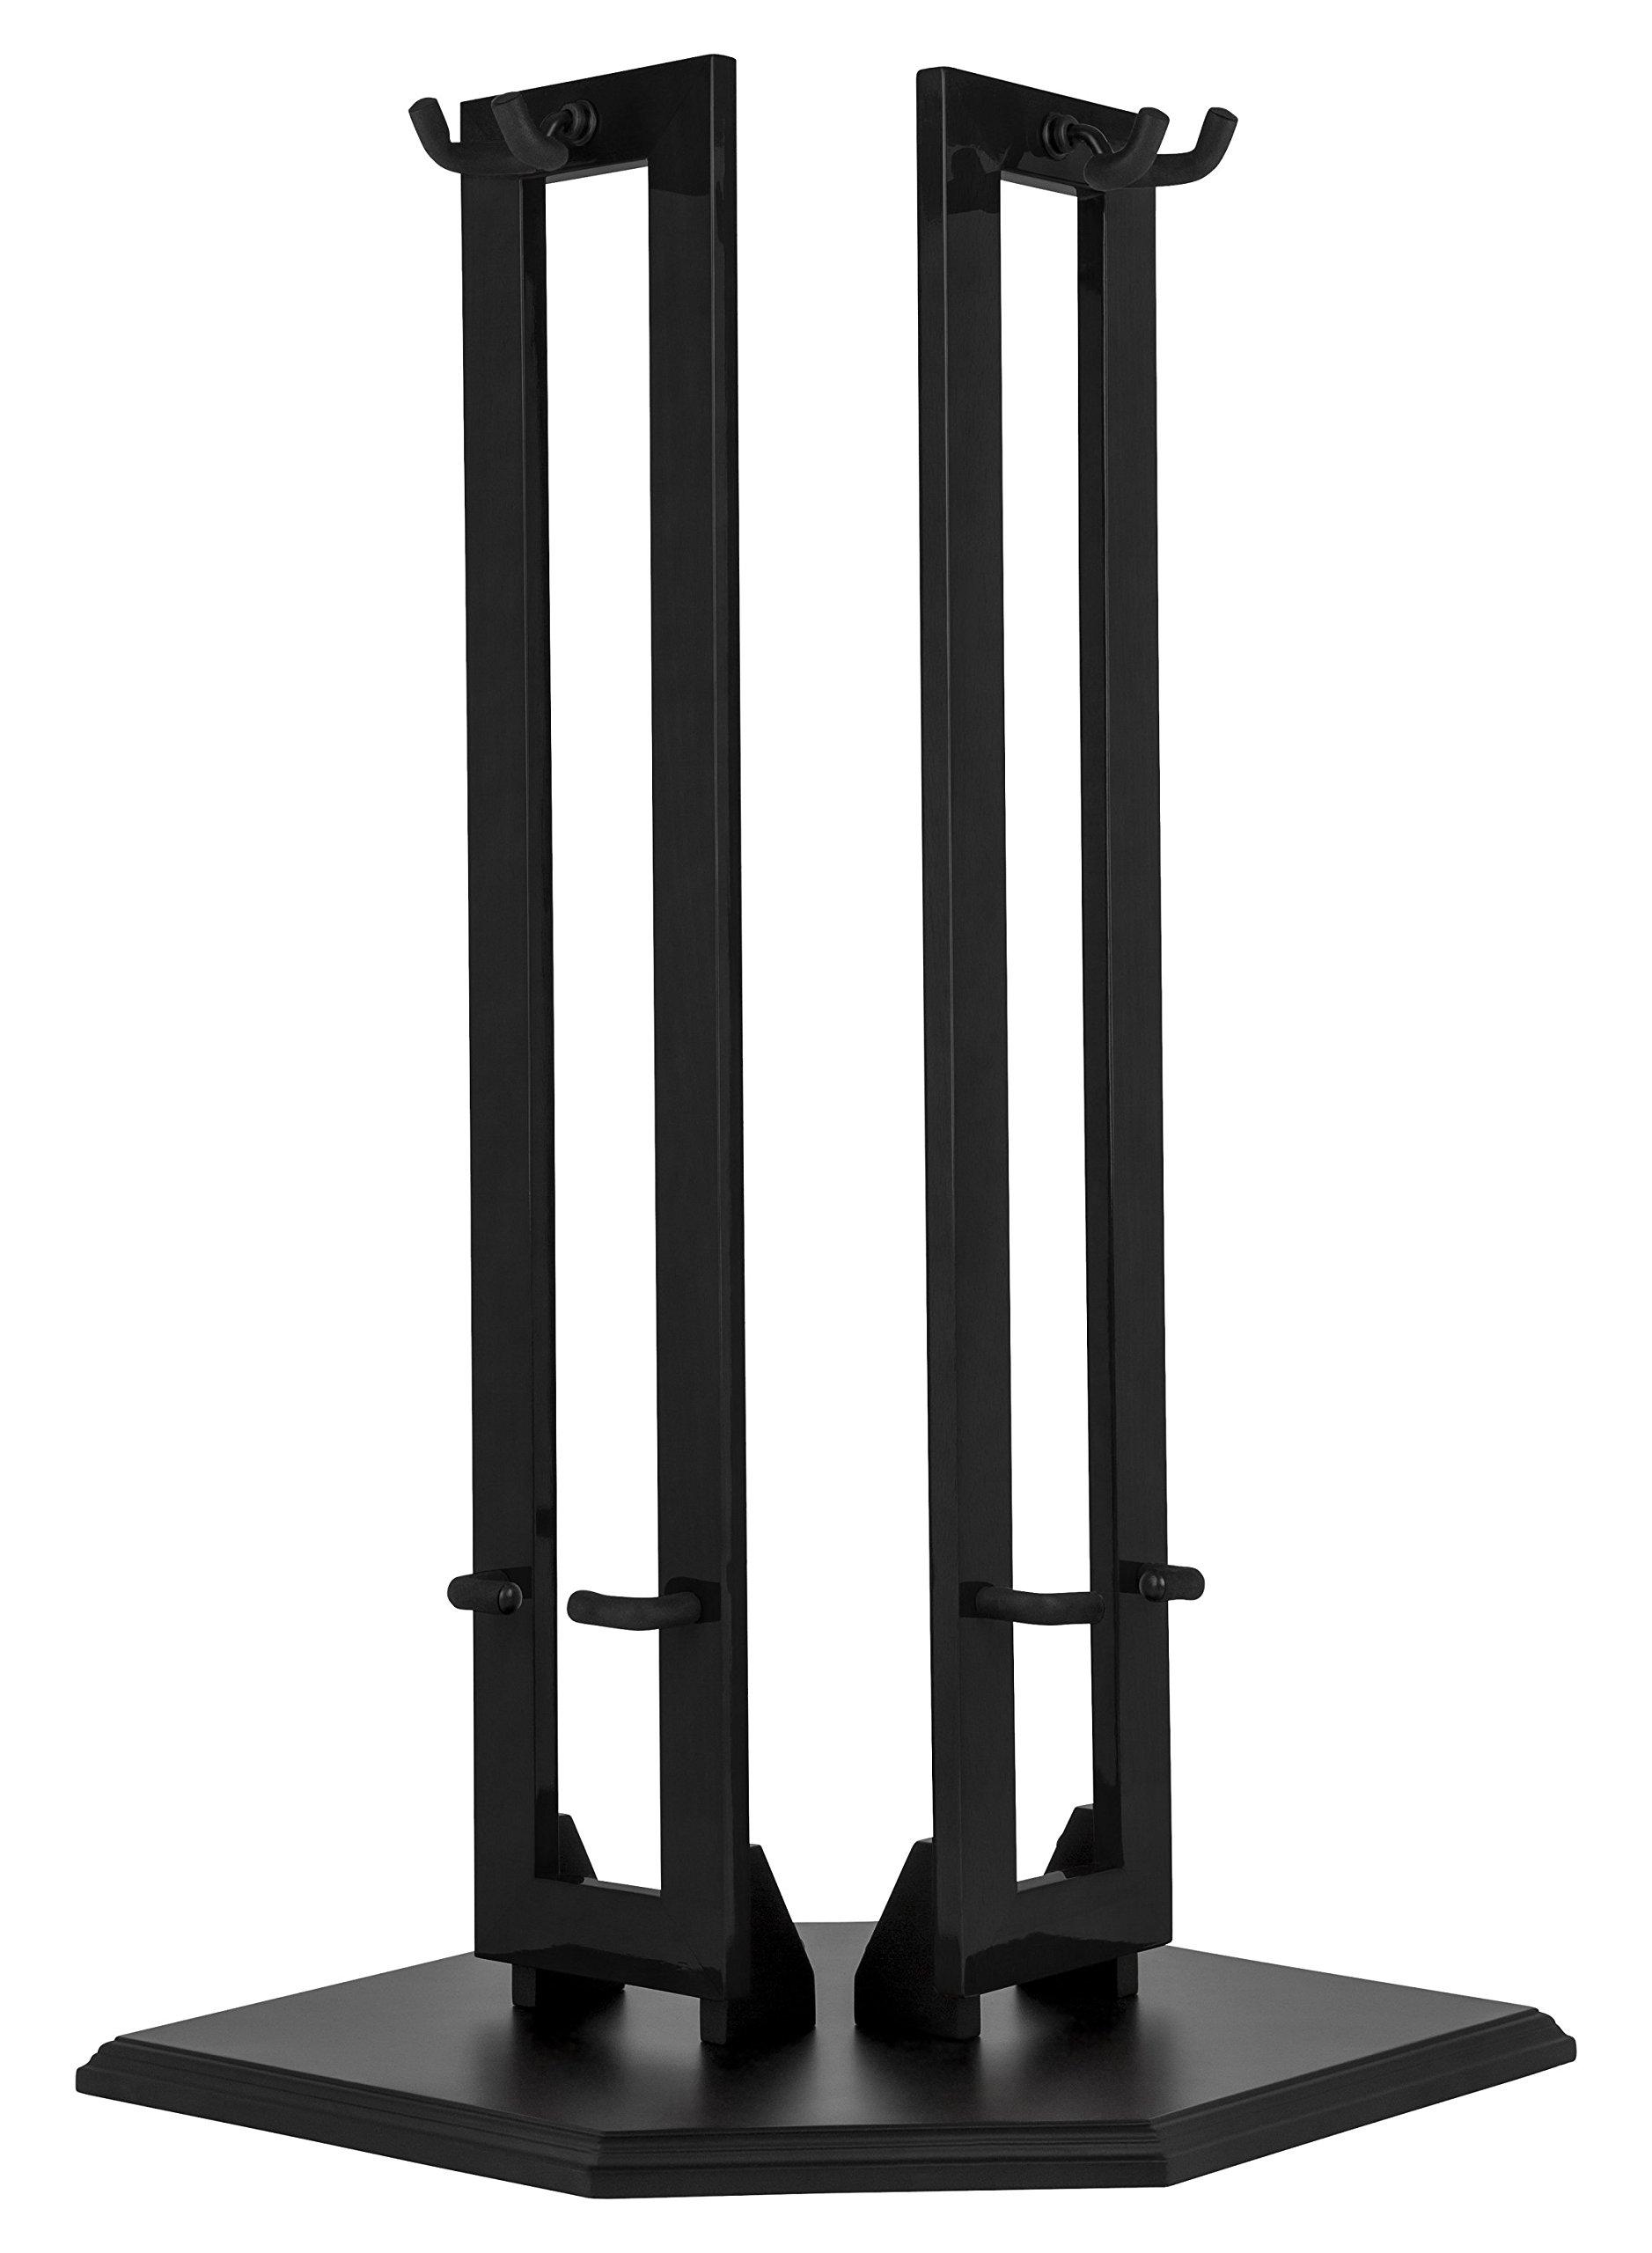 Fender Fender Hanging Wood Double Guitar Stand, Black by Fender (Image #1)